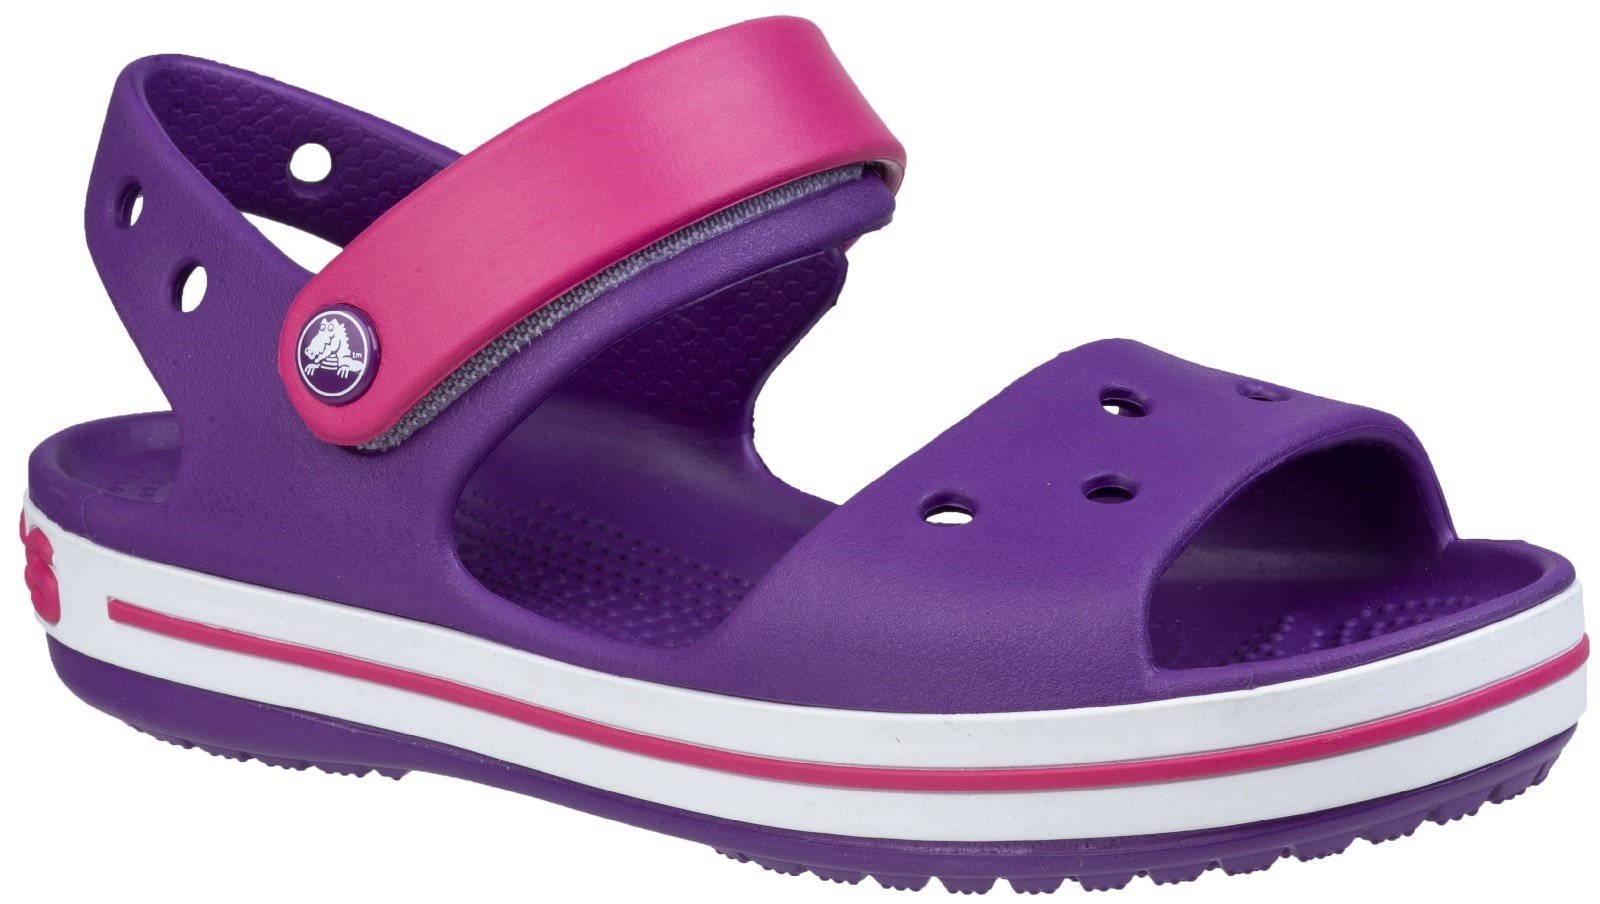 Crocs Kid's Sandal Various Colours 21077 - Purple/Pink/White 5